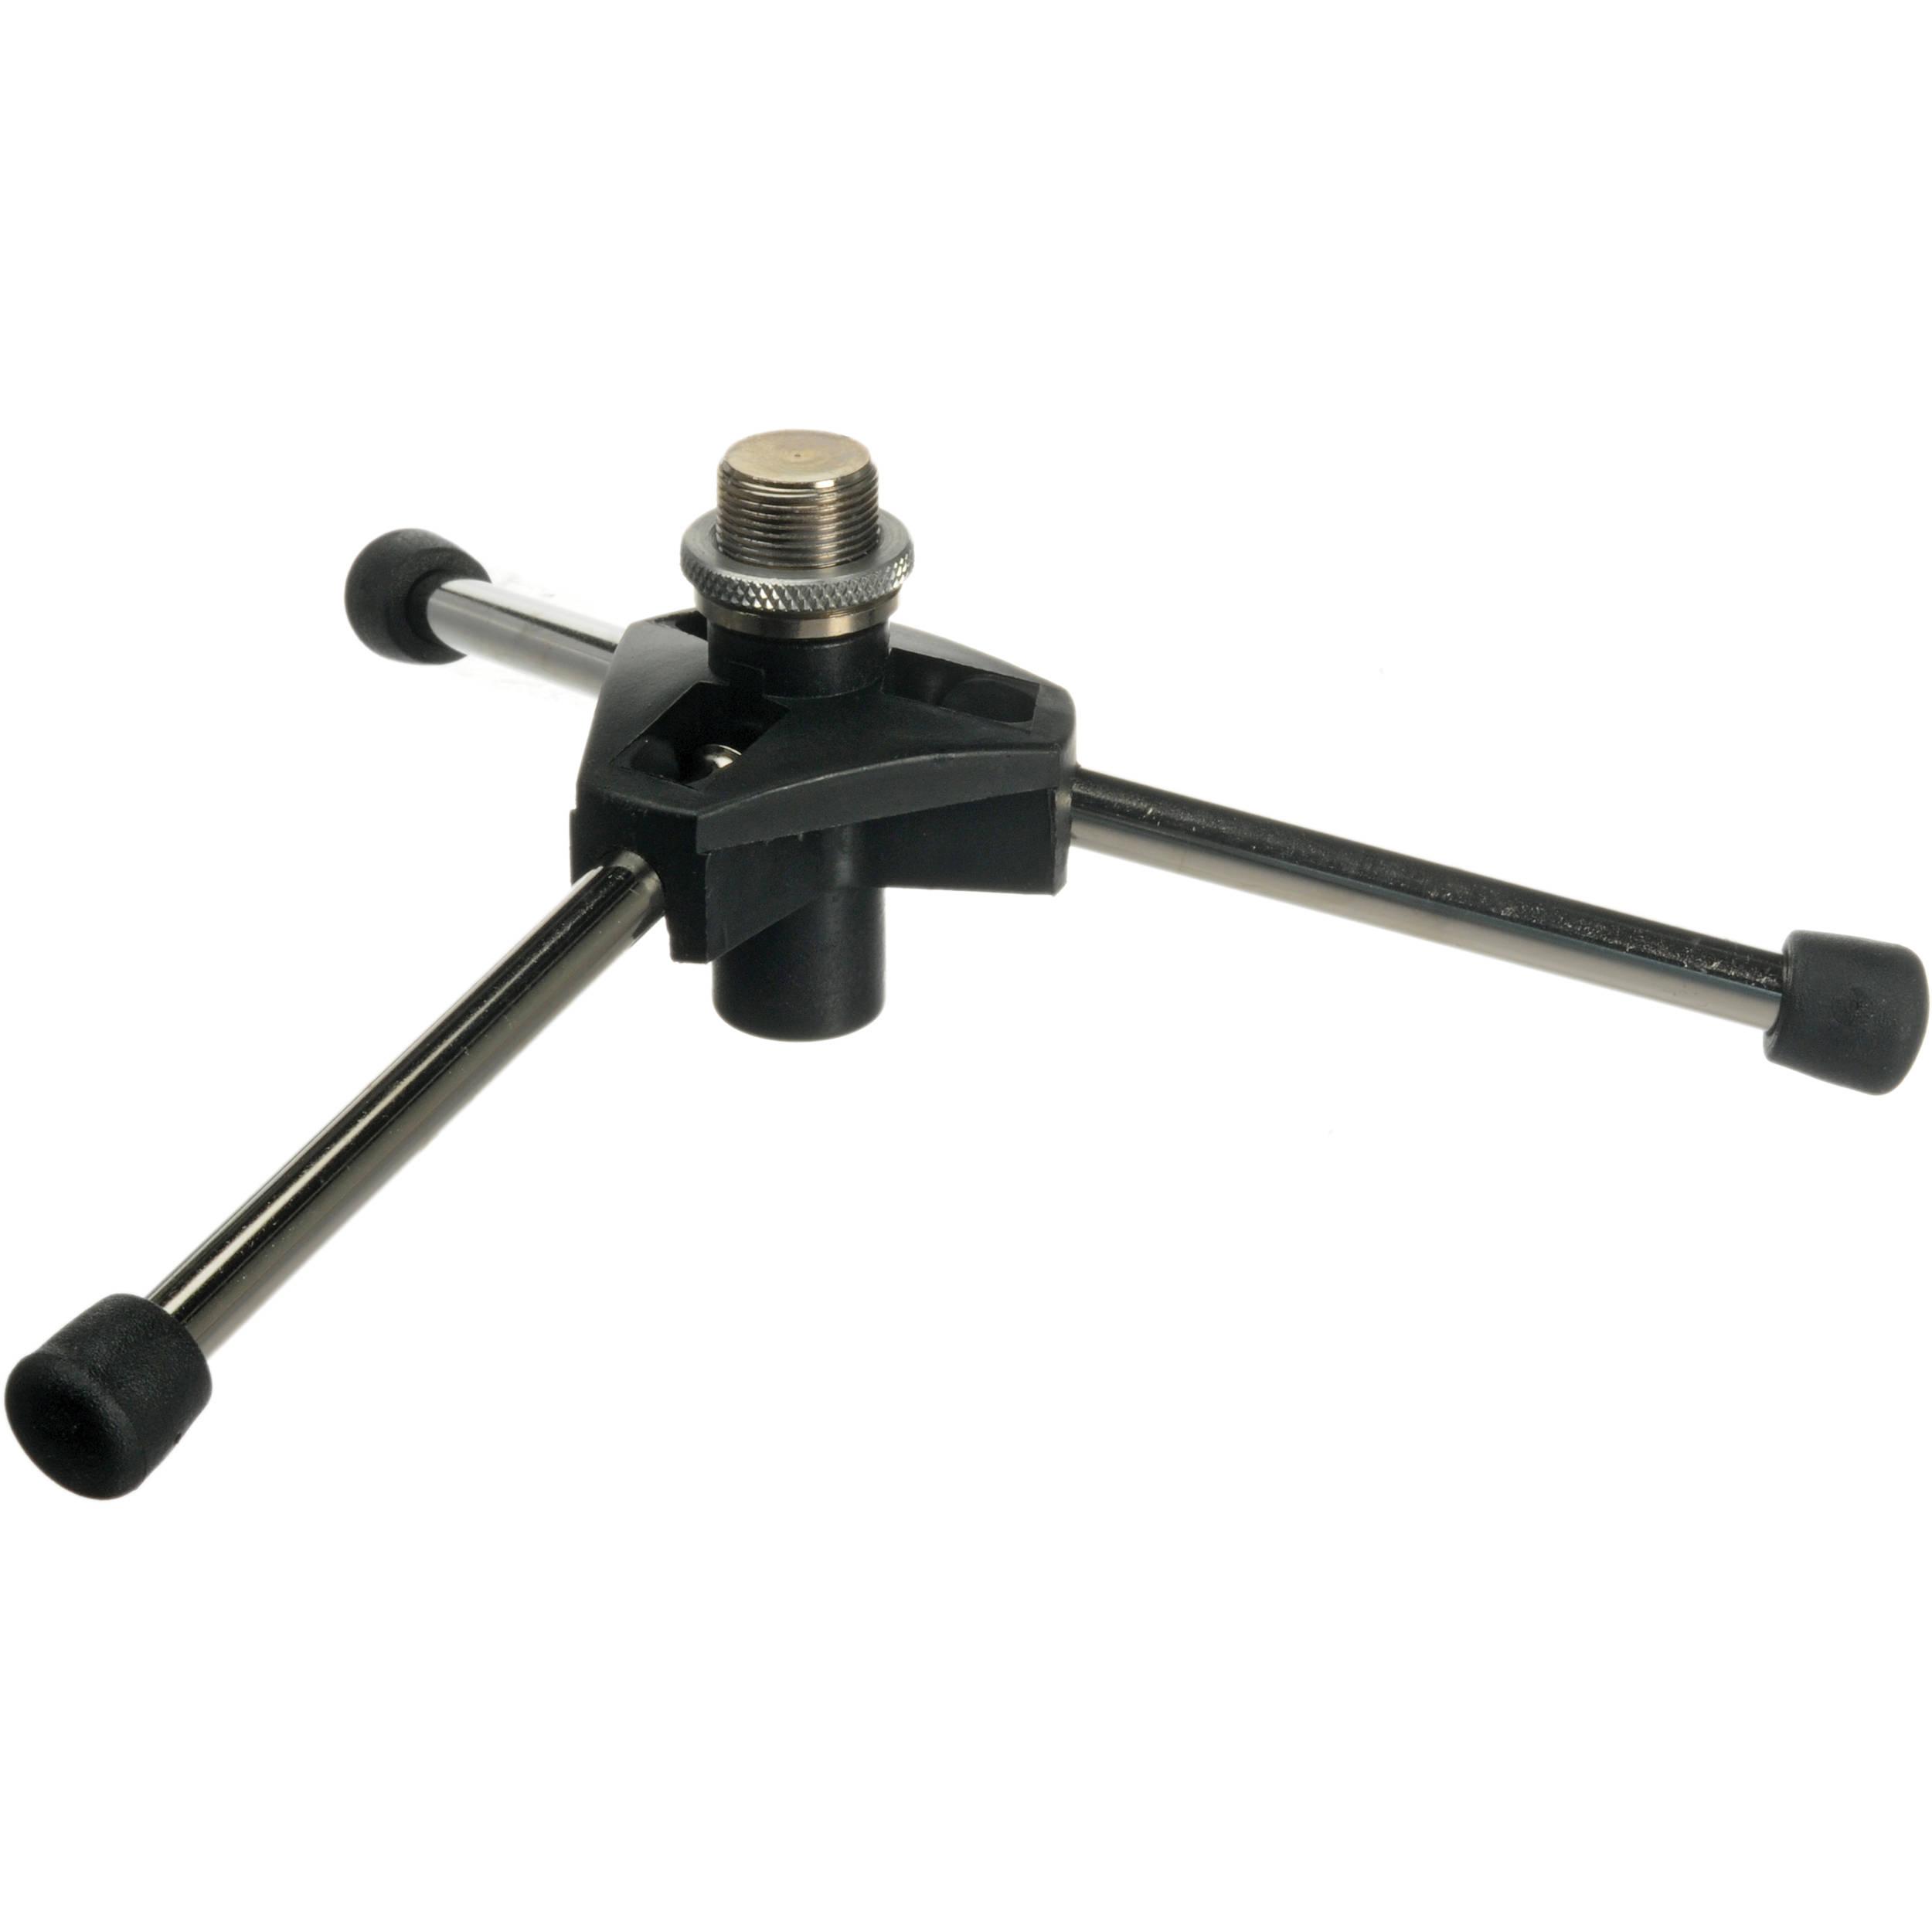 AKG 2311 Miniature Tripod Microphone Desk Stand KM2311 BH